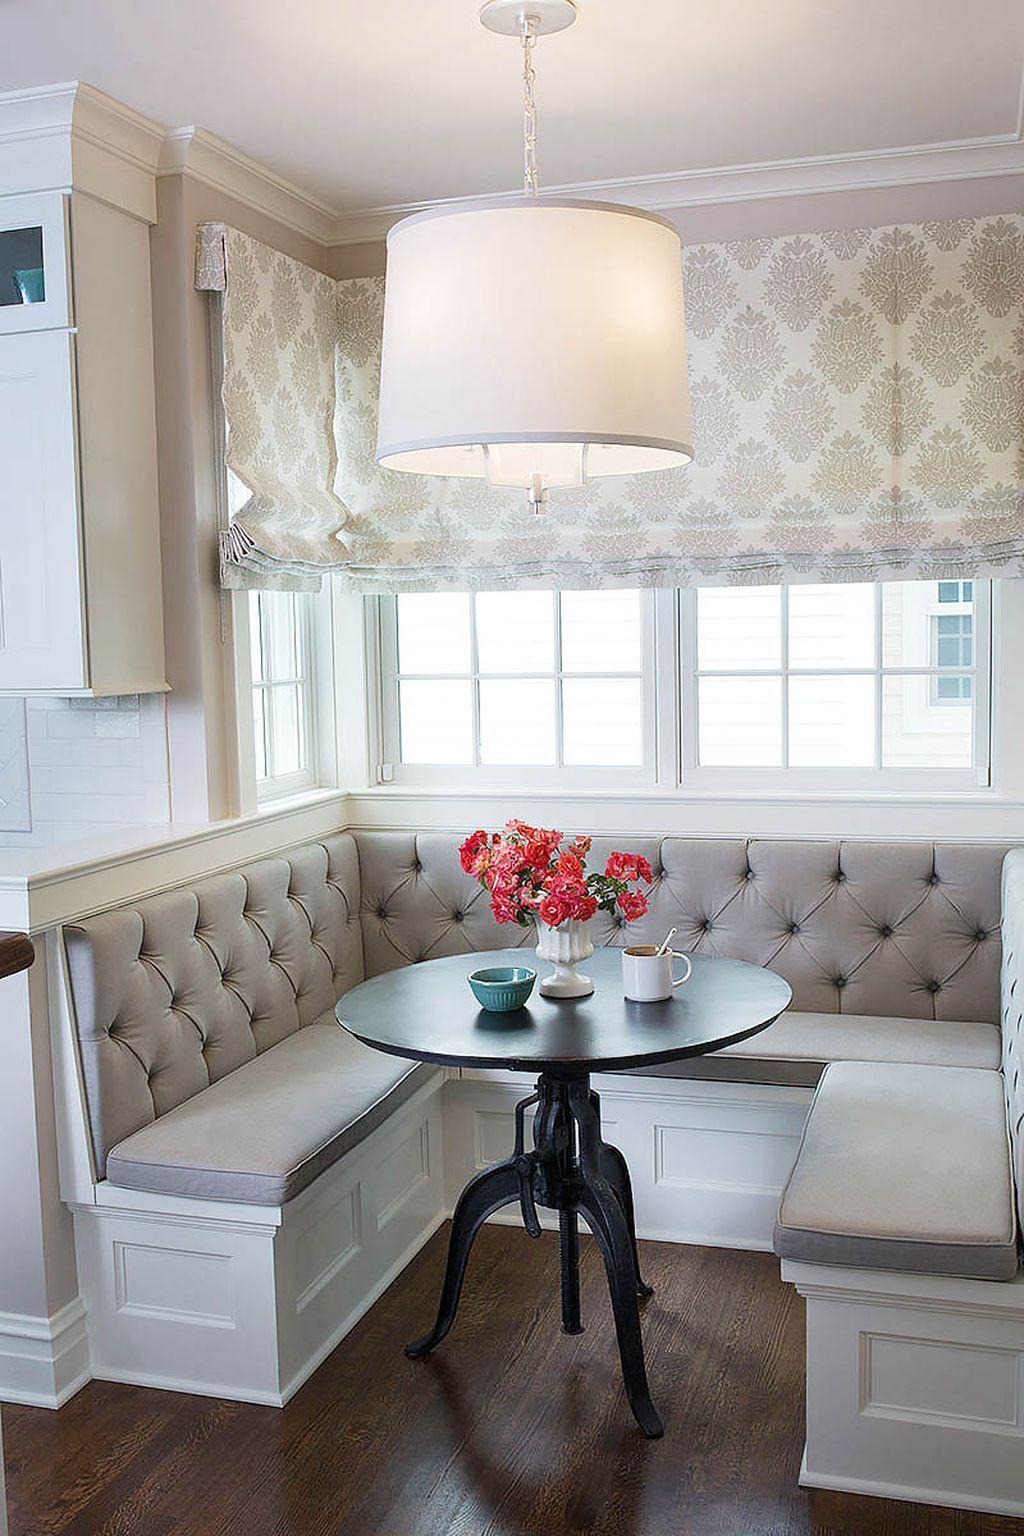 80 Built In Kitchen Banquette Ideas 42 Furniture Inspiration